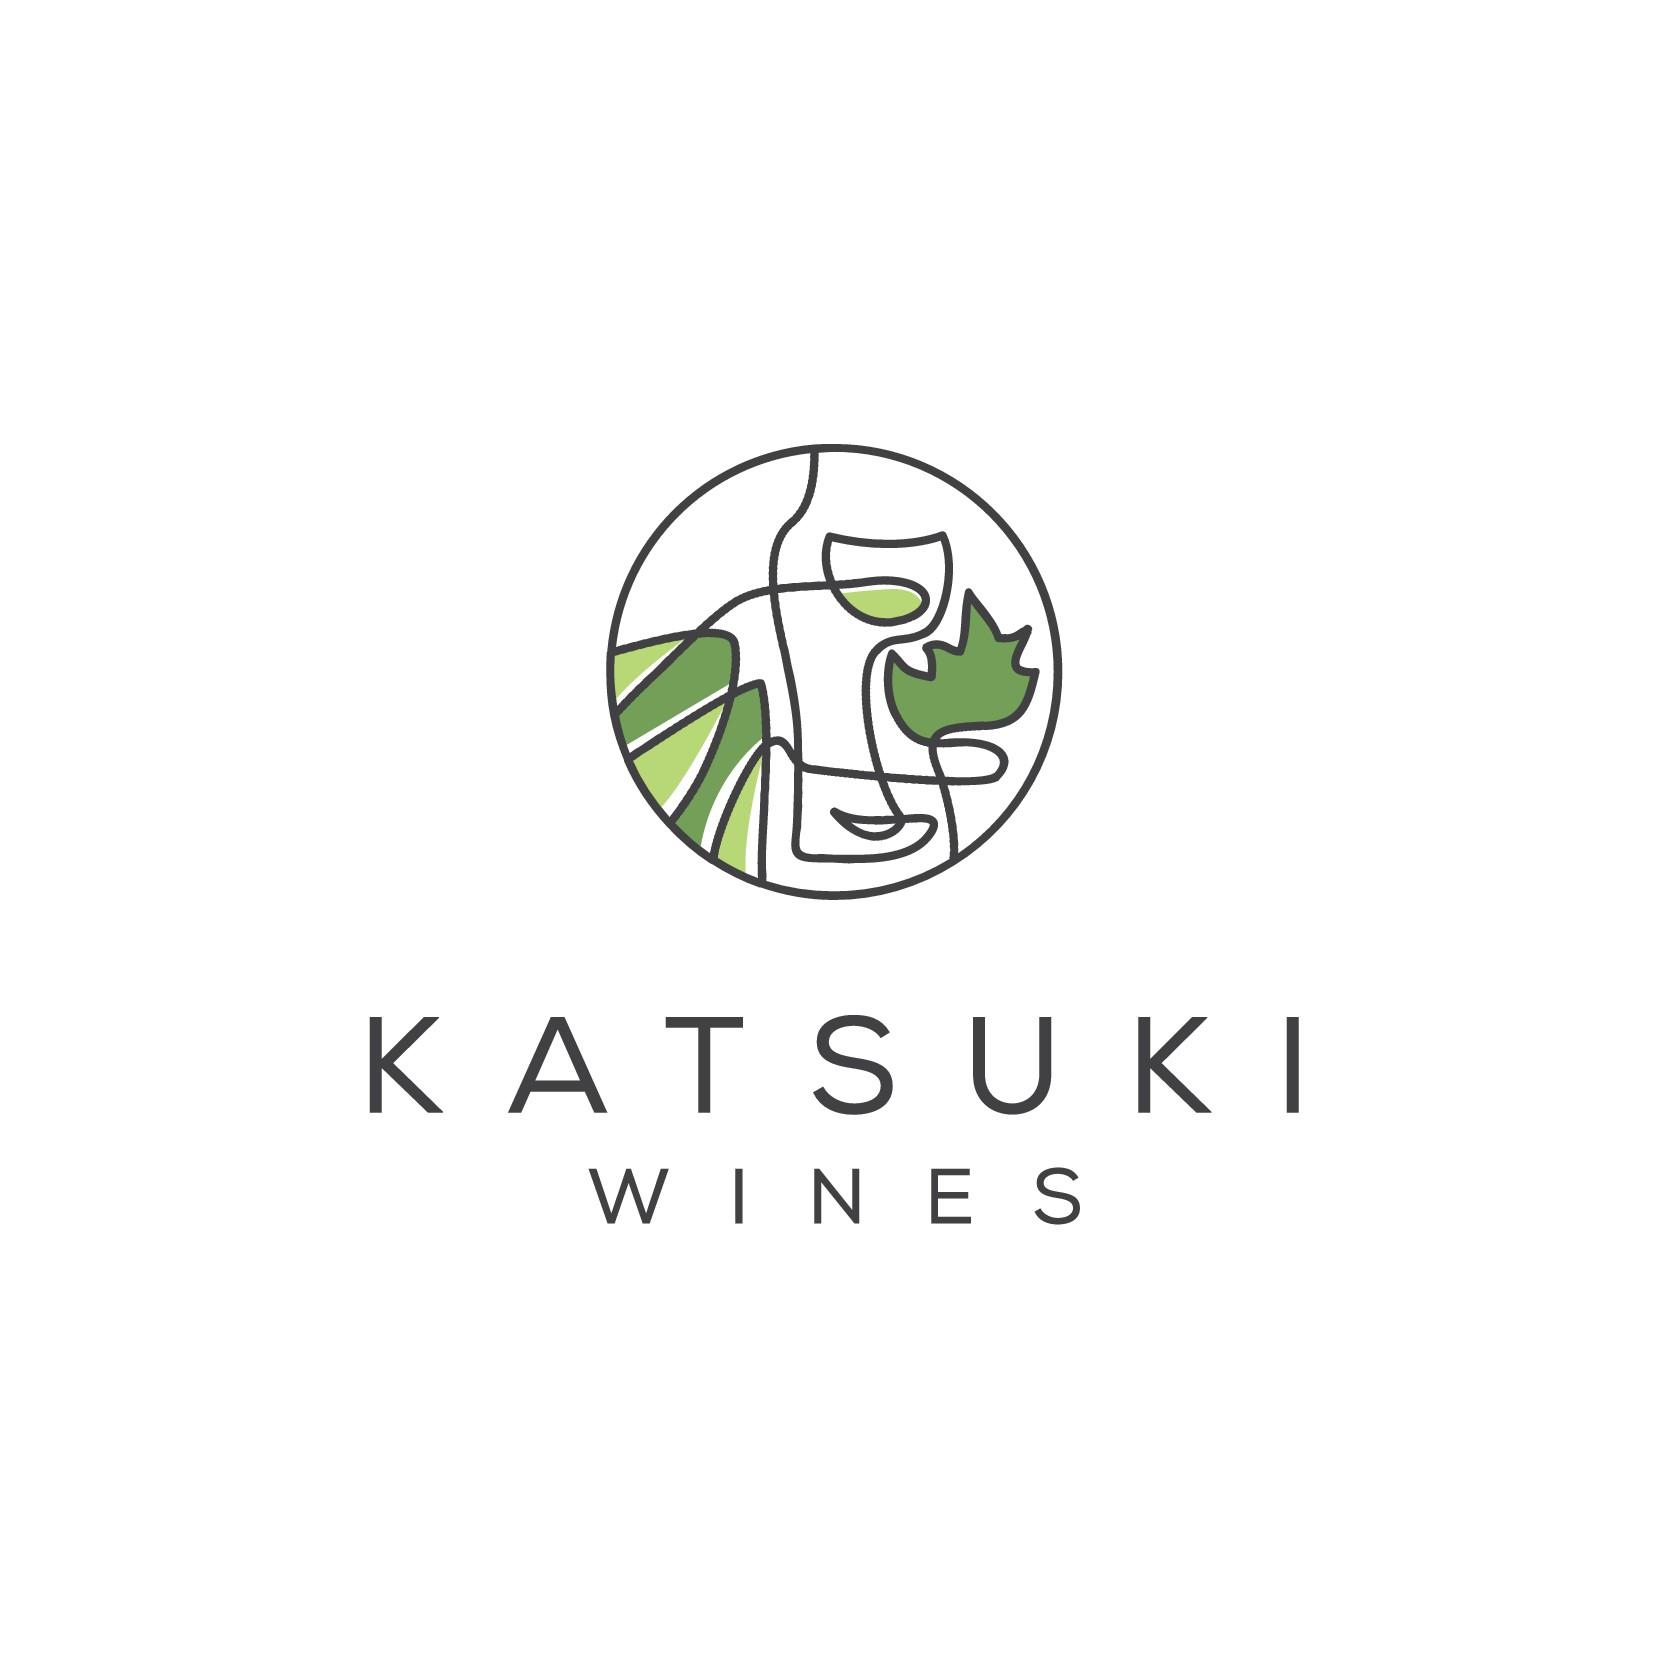 Design a clean logo for Japanese natural winery 日本のナチュラルワイナリーのシンプルでクリーンなデザイン